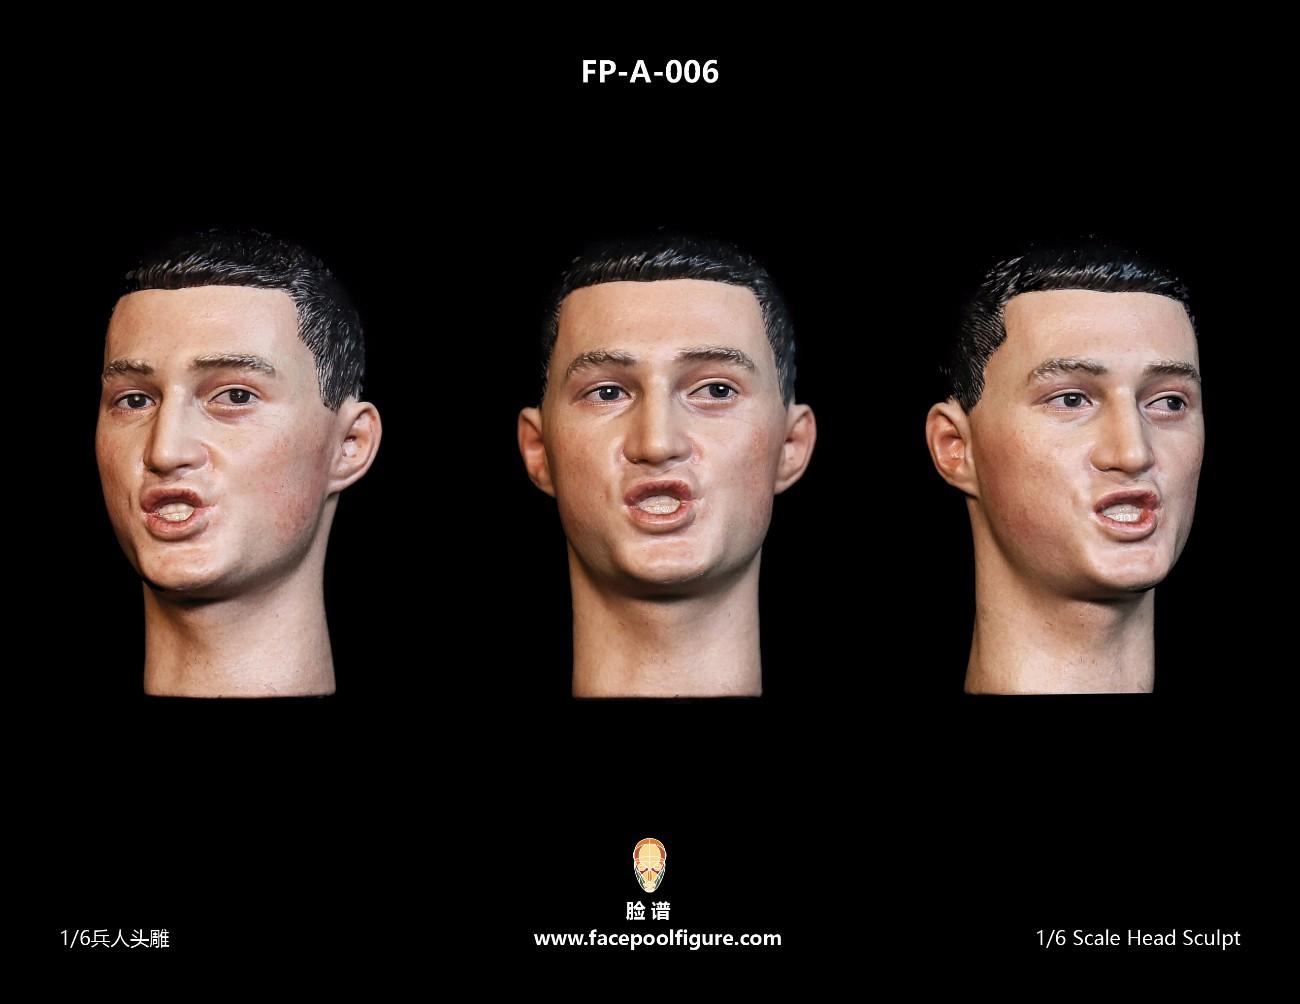 fpf-heads02